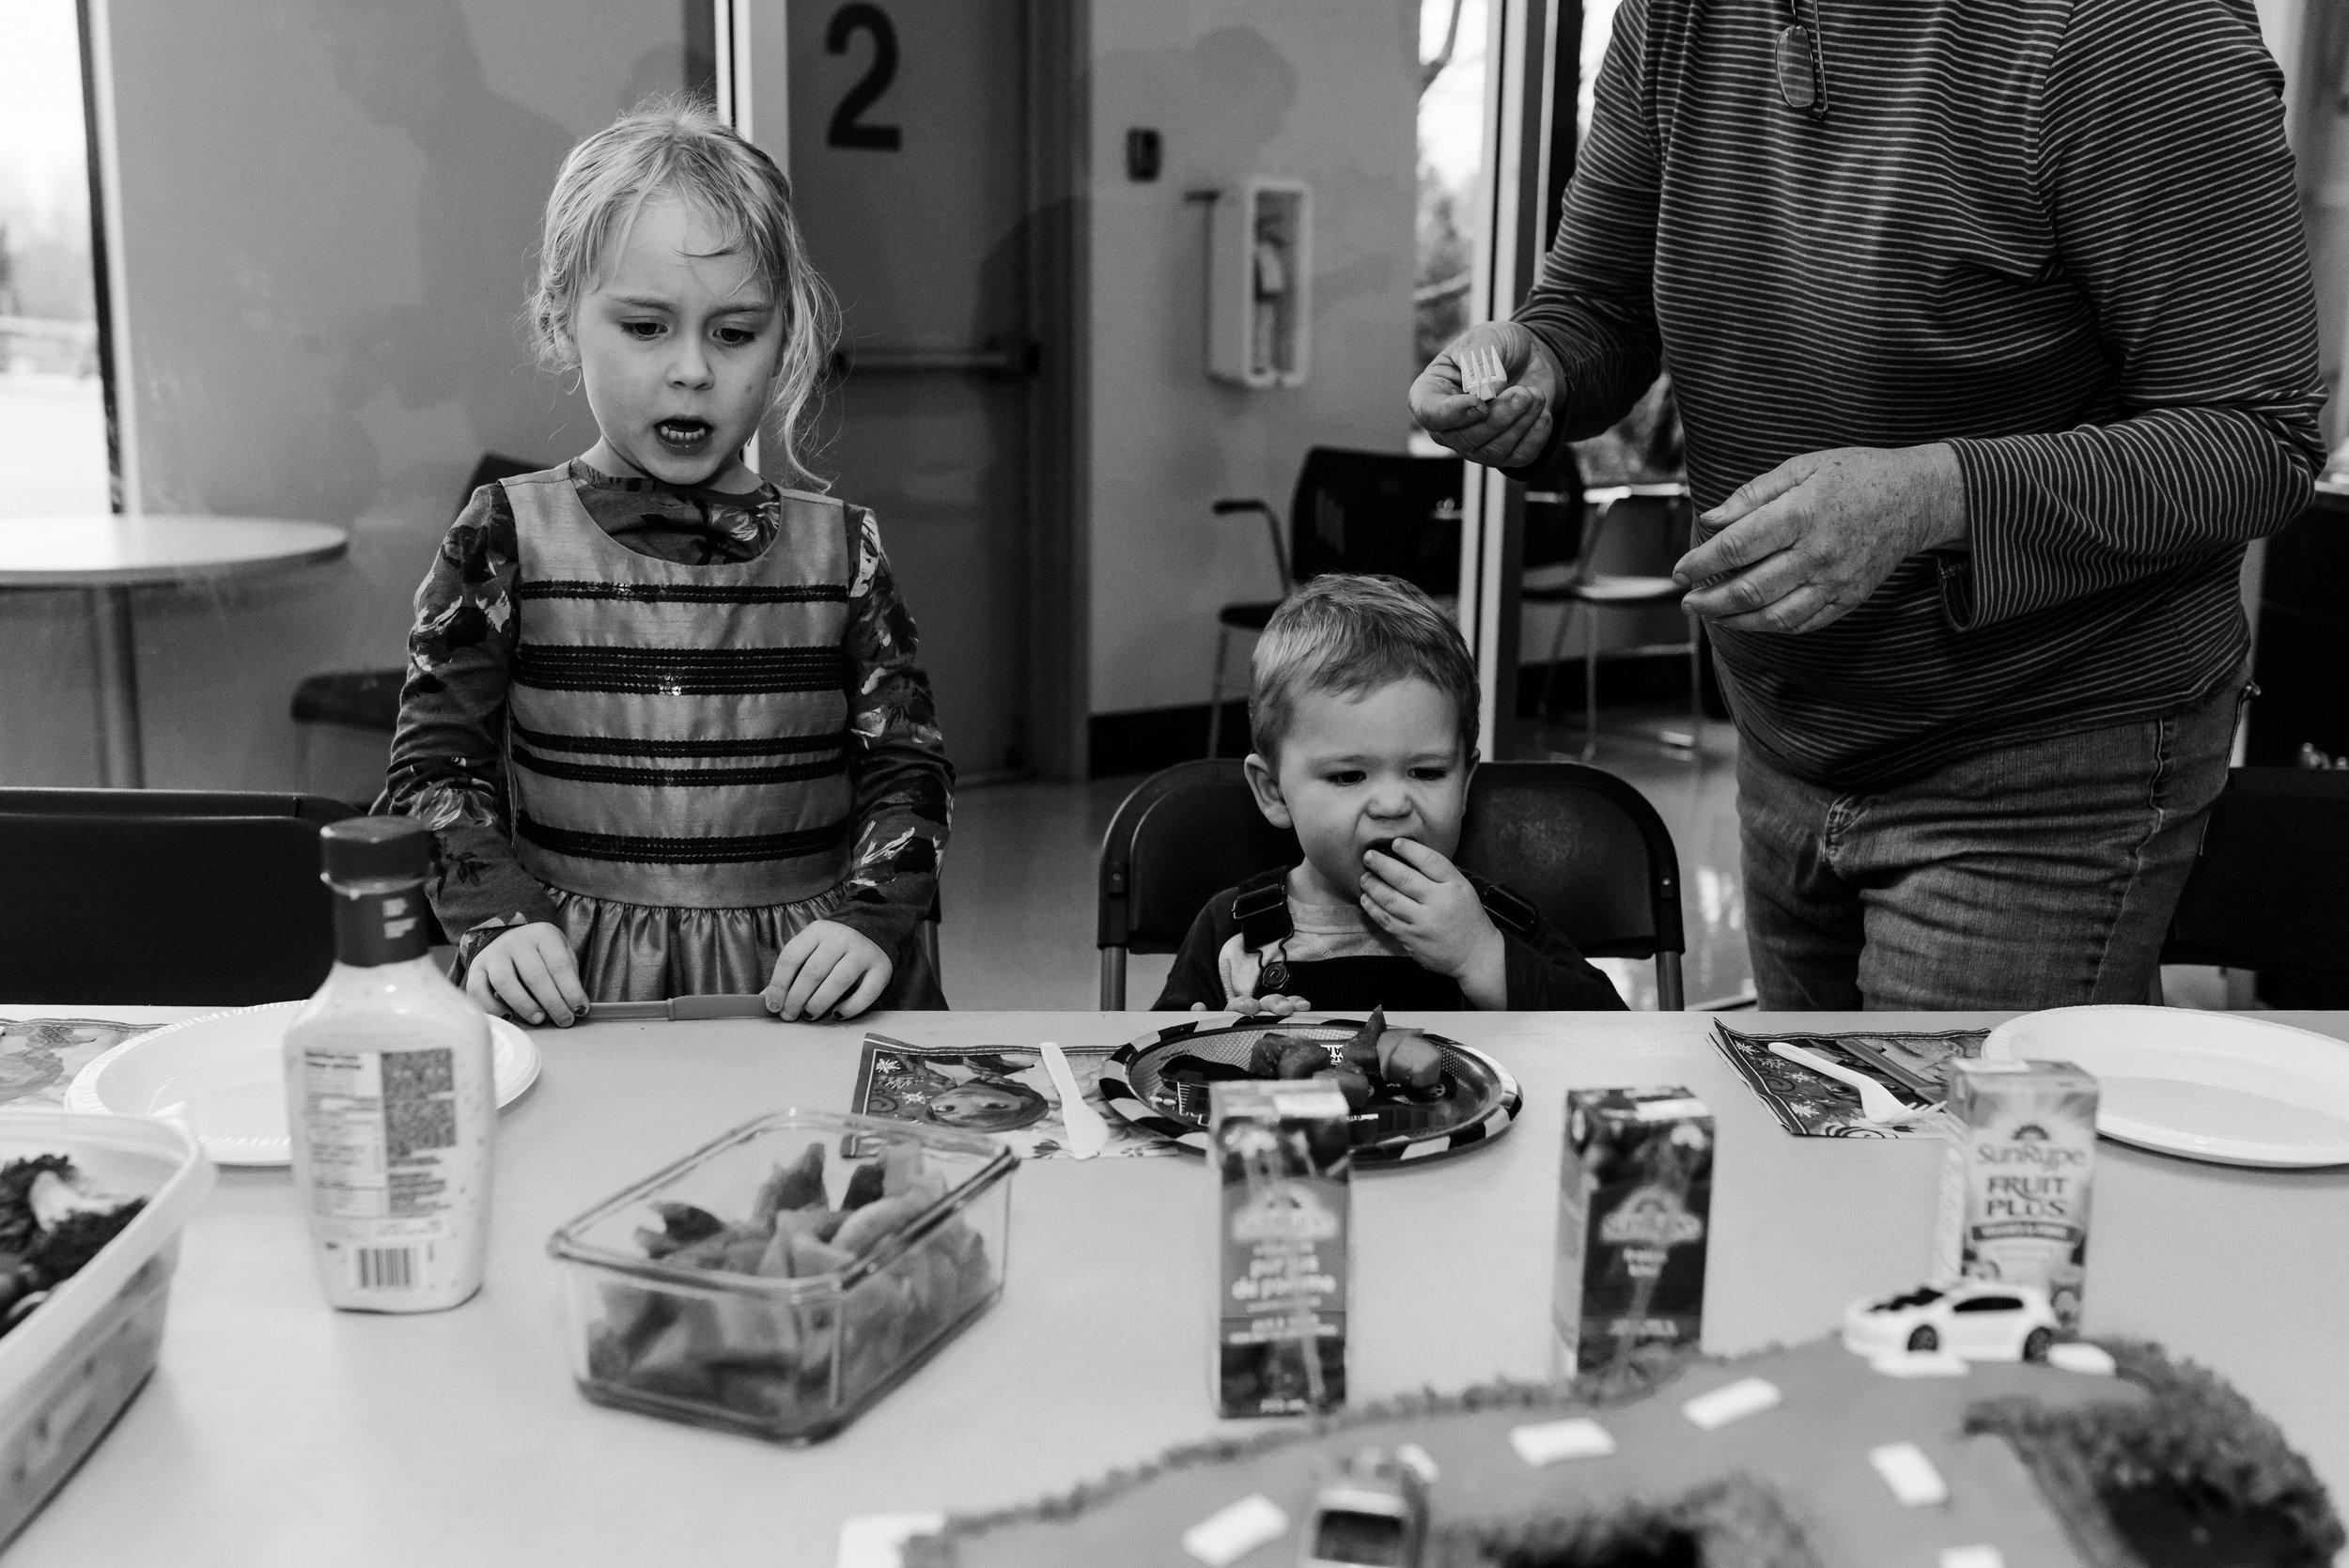 Nicola_Reiersen_Photography_Kids_Birthday_Pool_Party (23).jpg